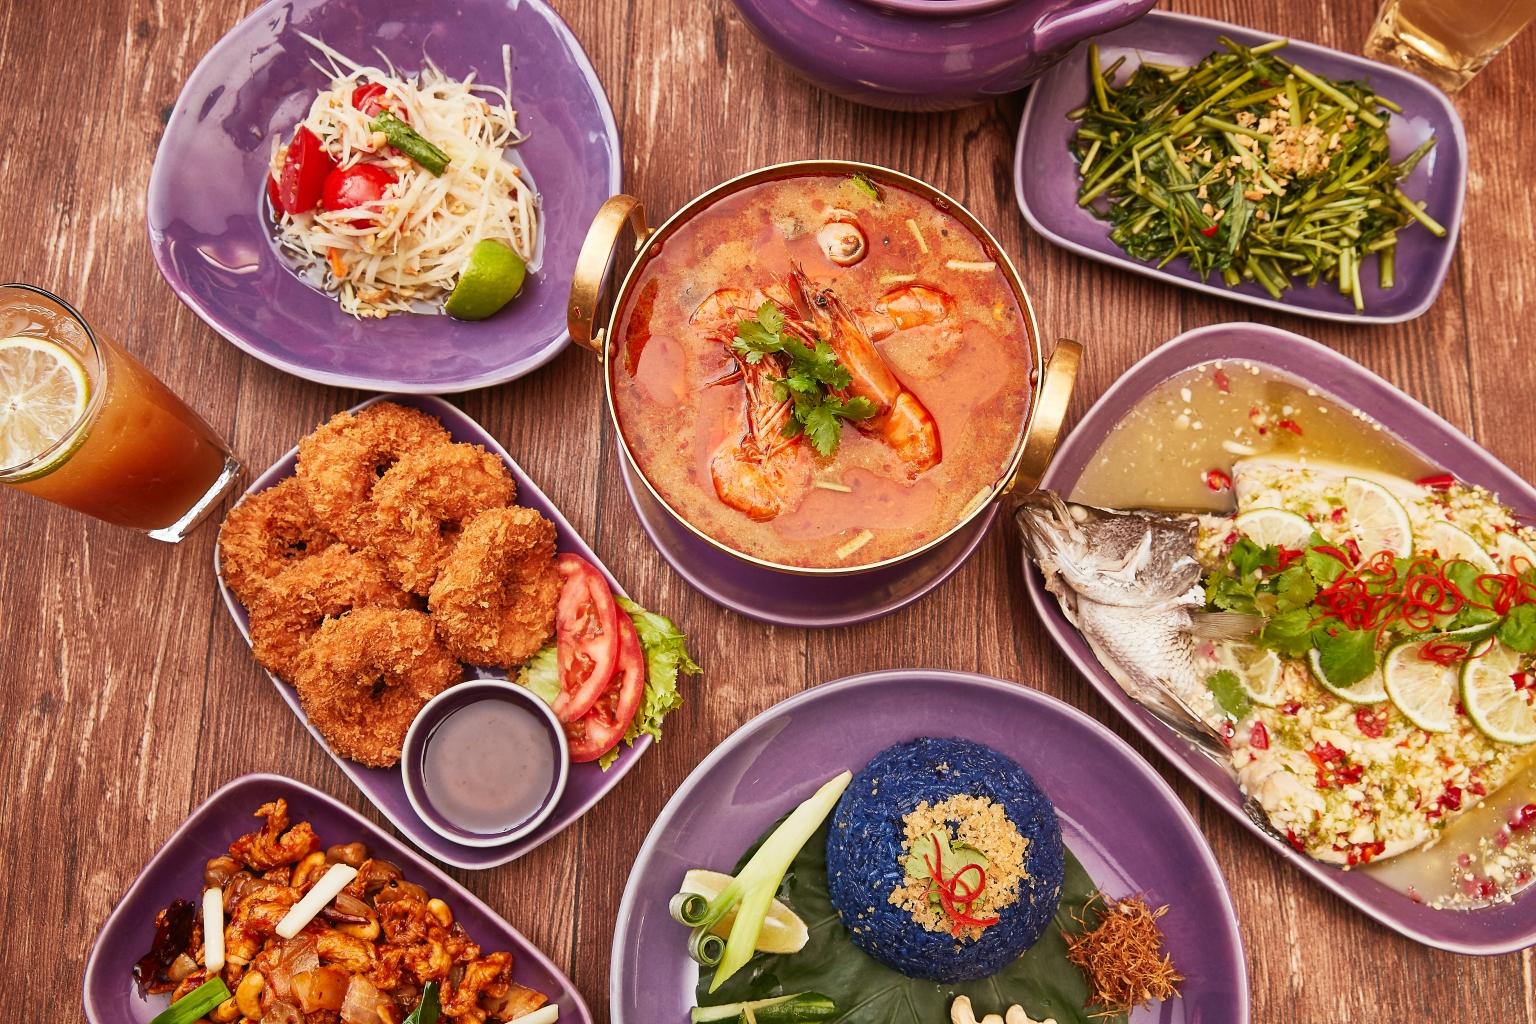 Nara Thai Cuisine紅到發紫進駐統一時代百貨台北店